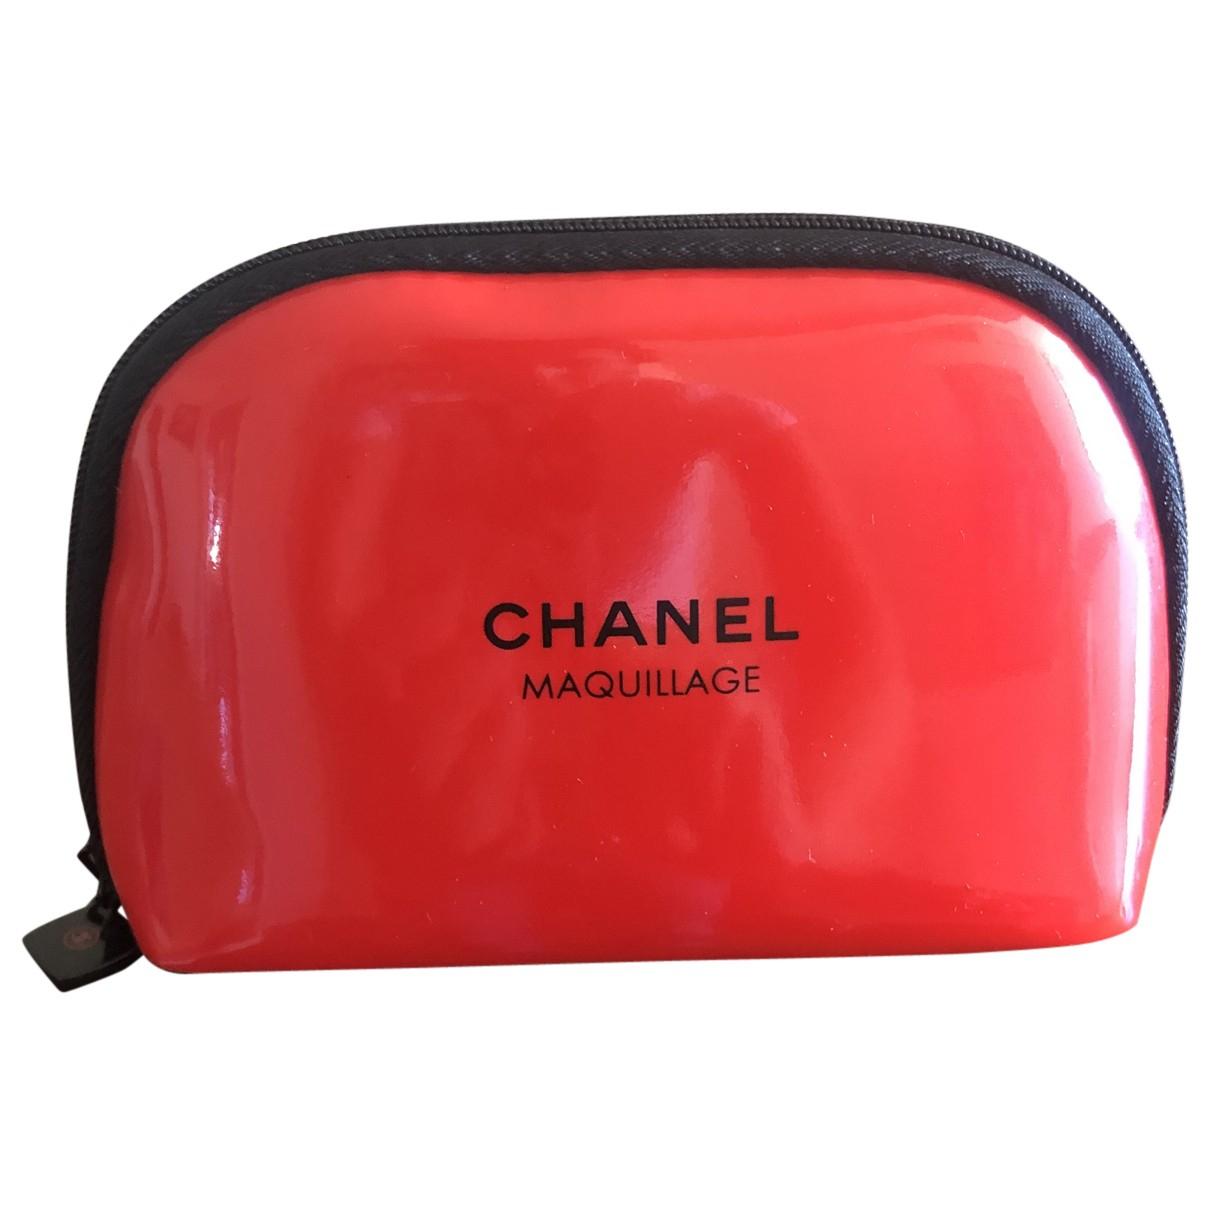 Marroquineria Chanel